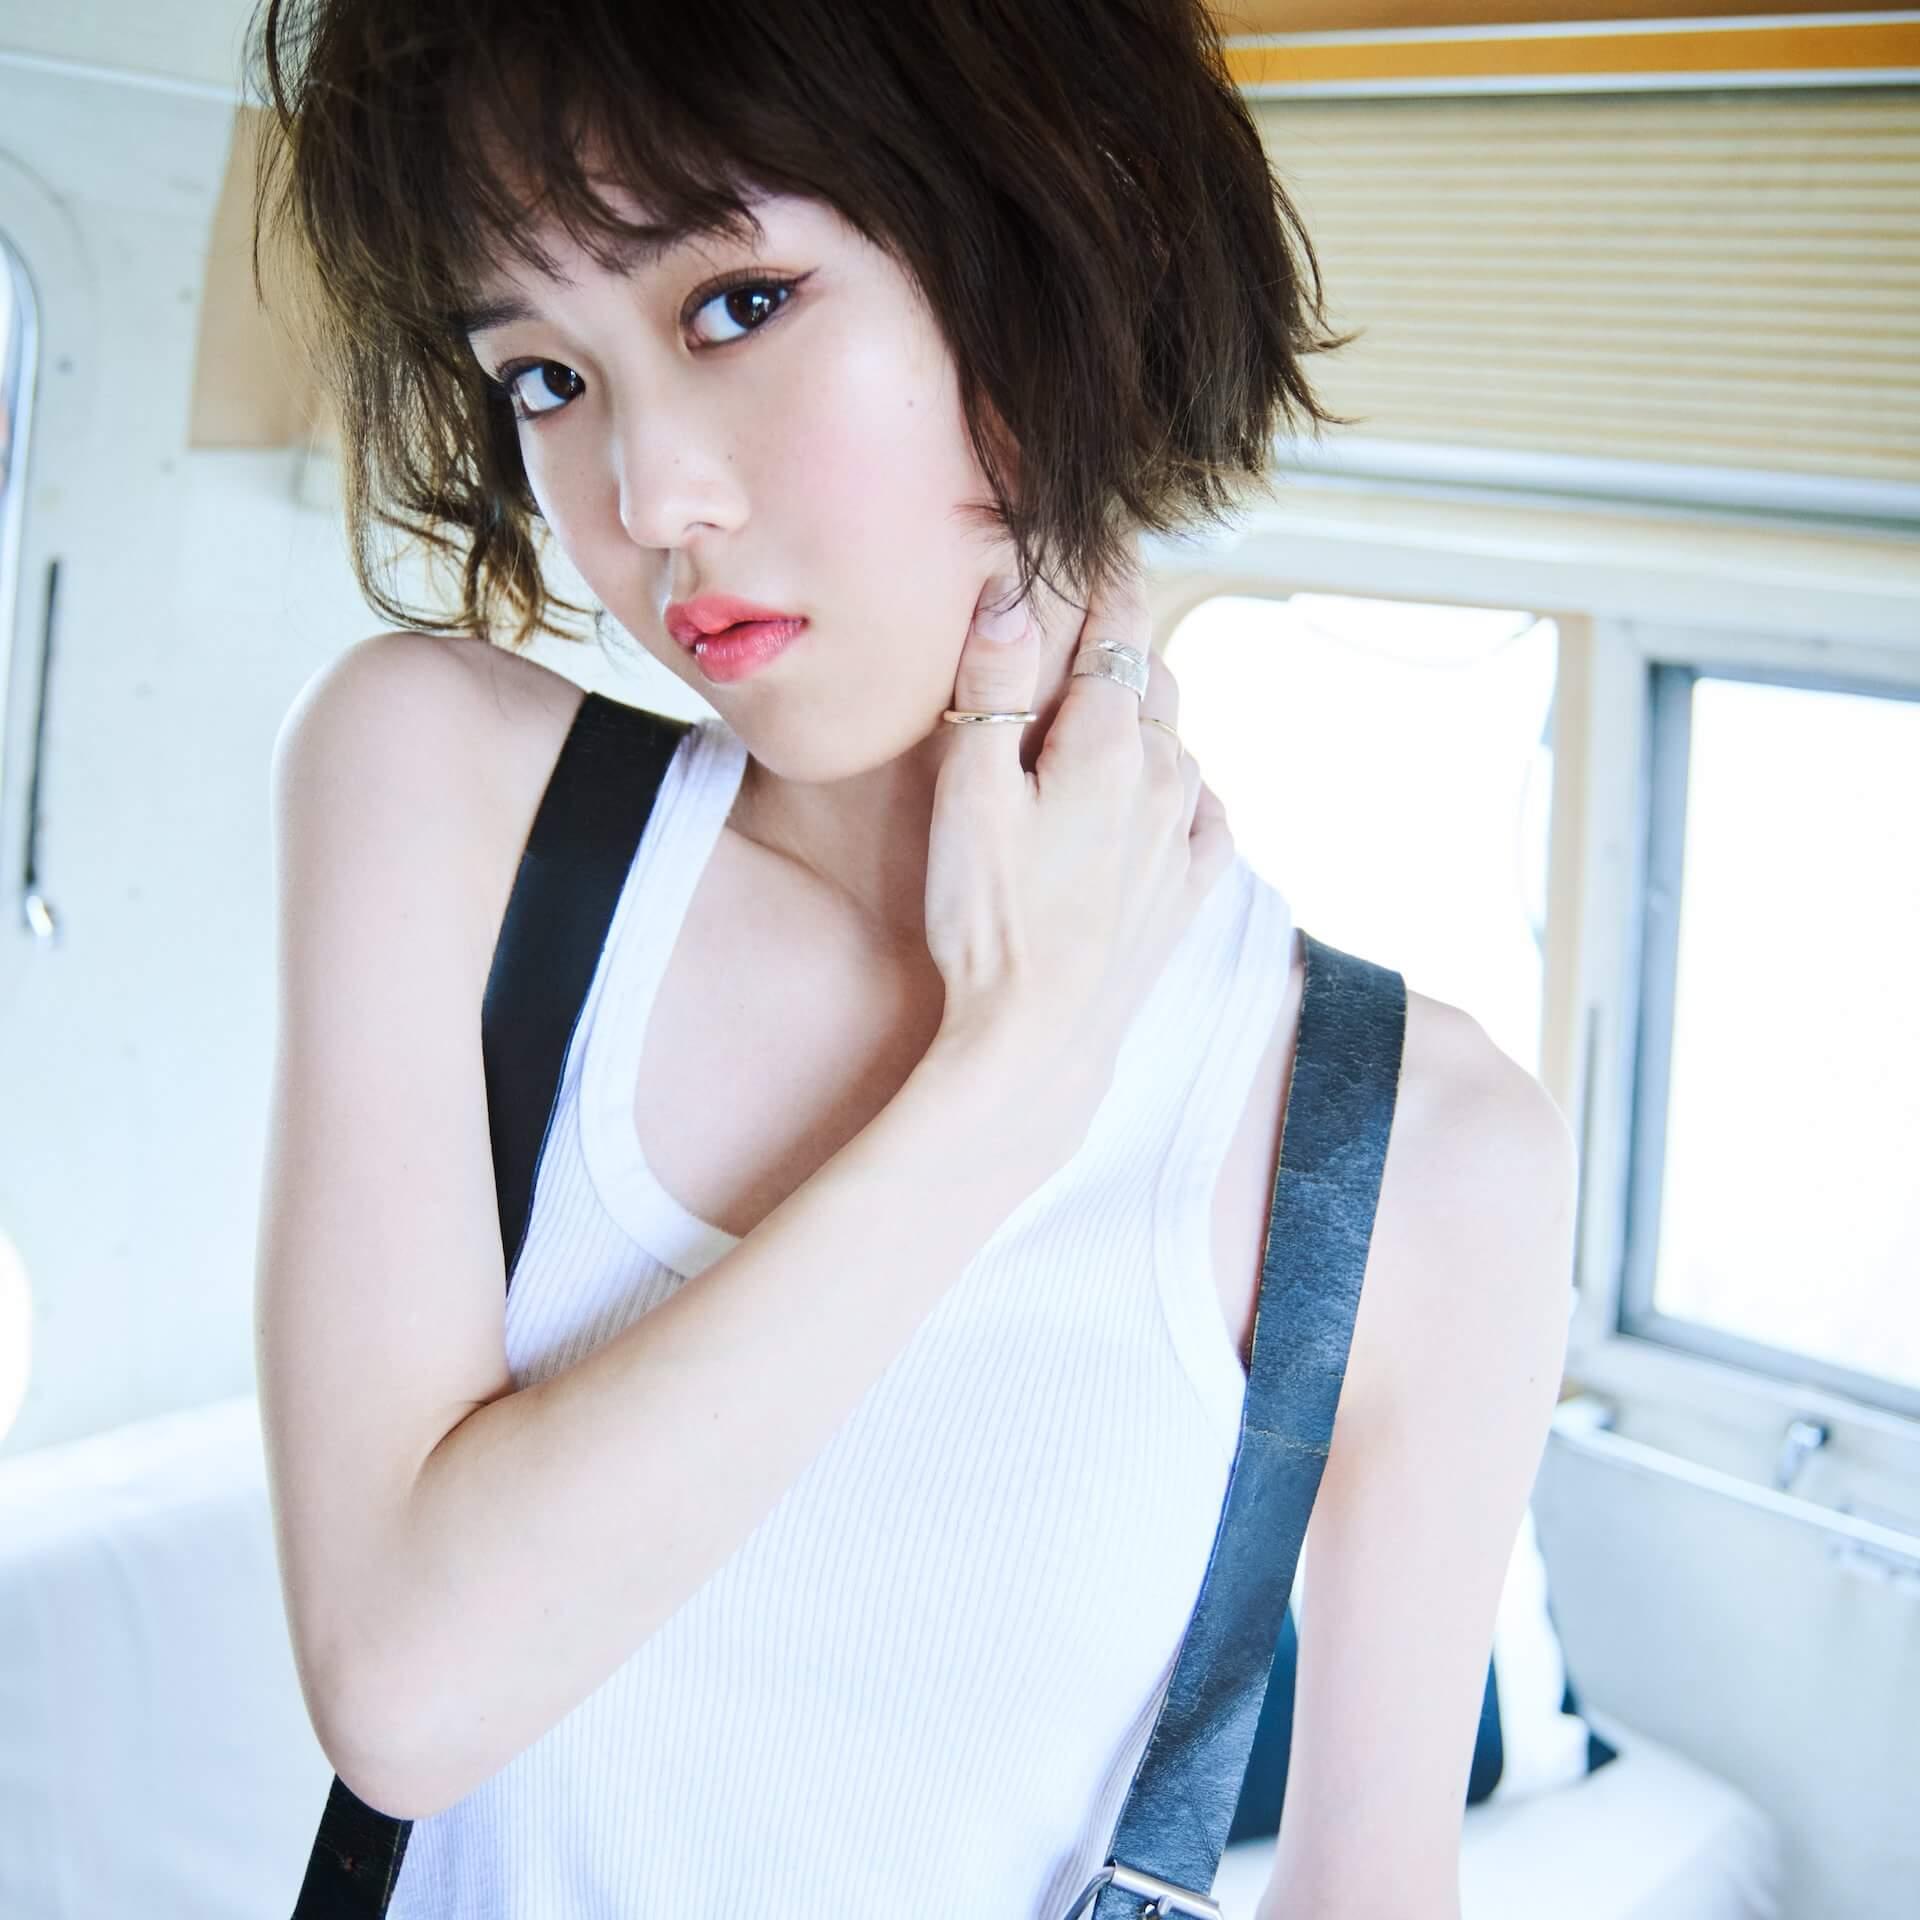 "Reiの2ndアルバム『HONEY』収録曲""Lonely Dance Club""の先行配信がスタート!Limited Edition収録ミュージック・フィルムのオンライン先行試写会も決定 music201112_Rei_2"